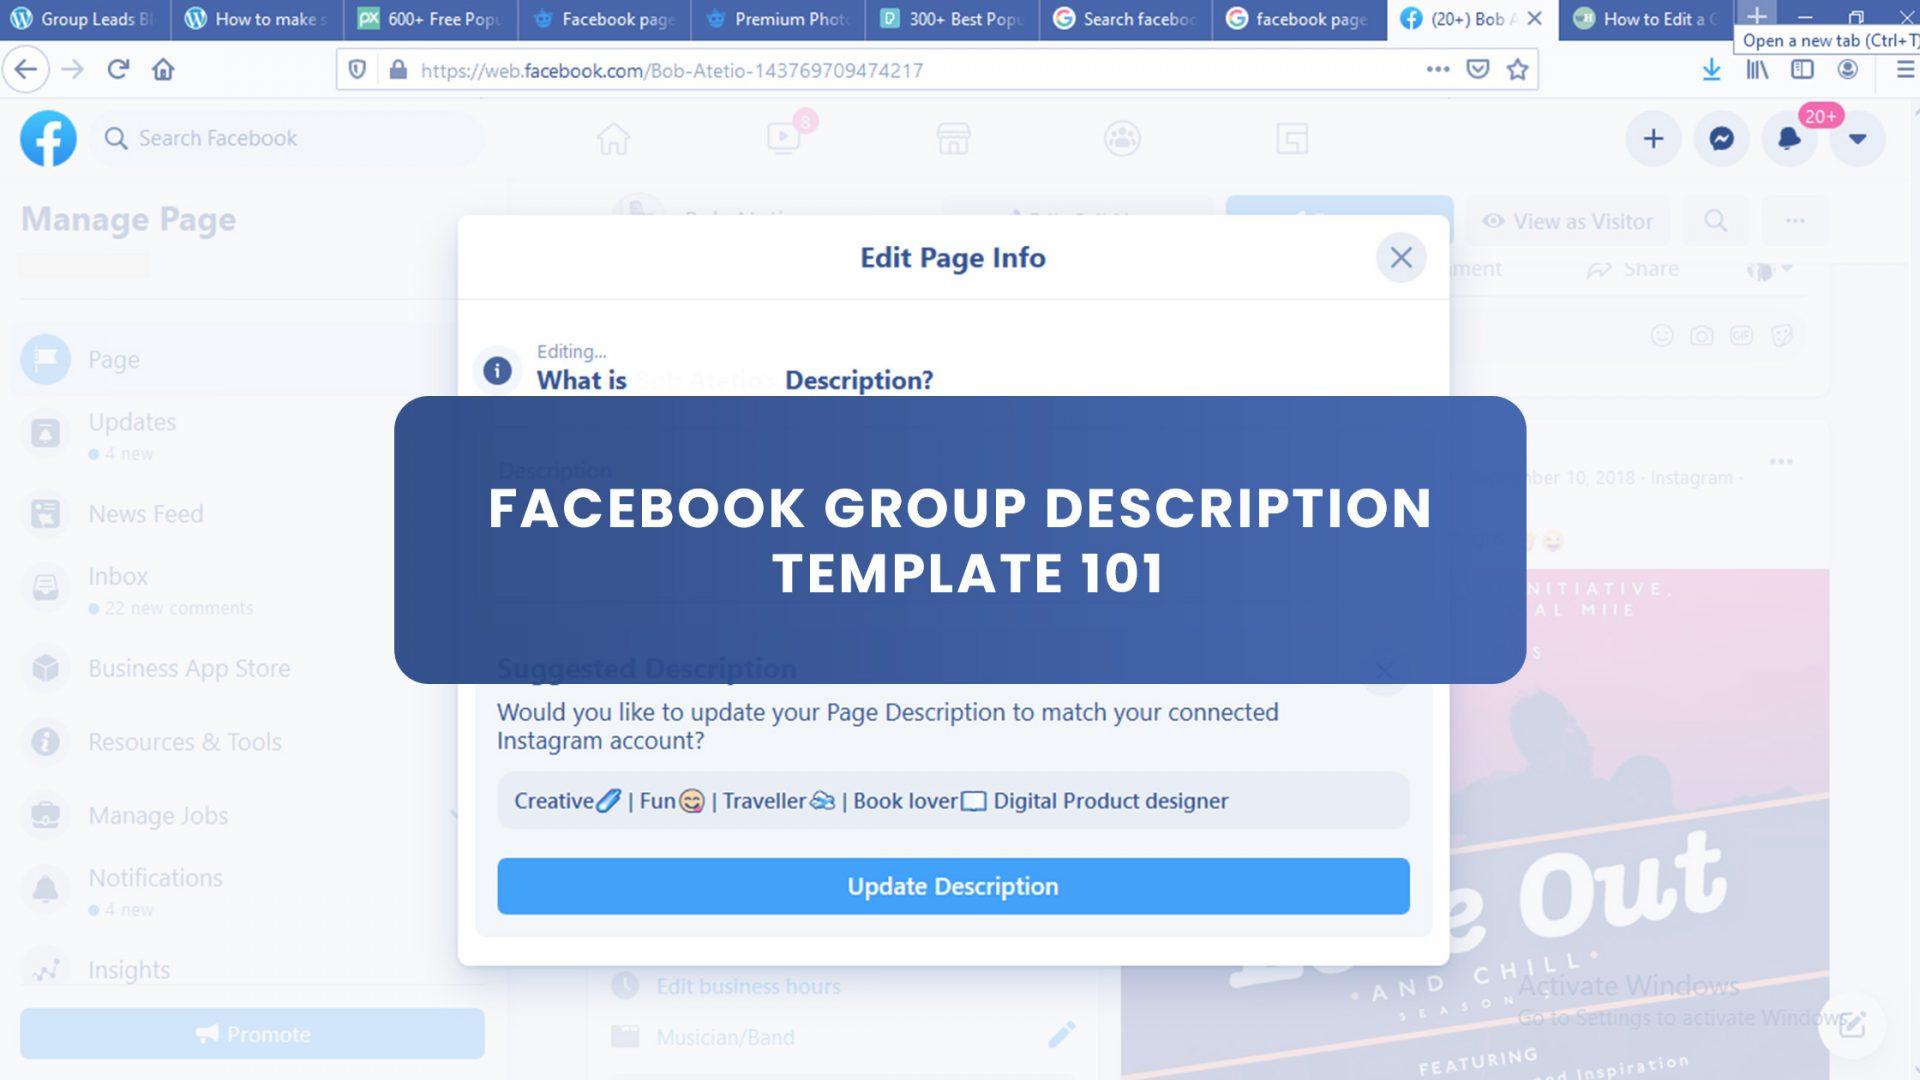 Facebook Group Description Template